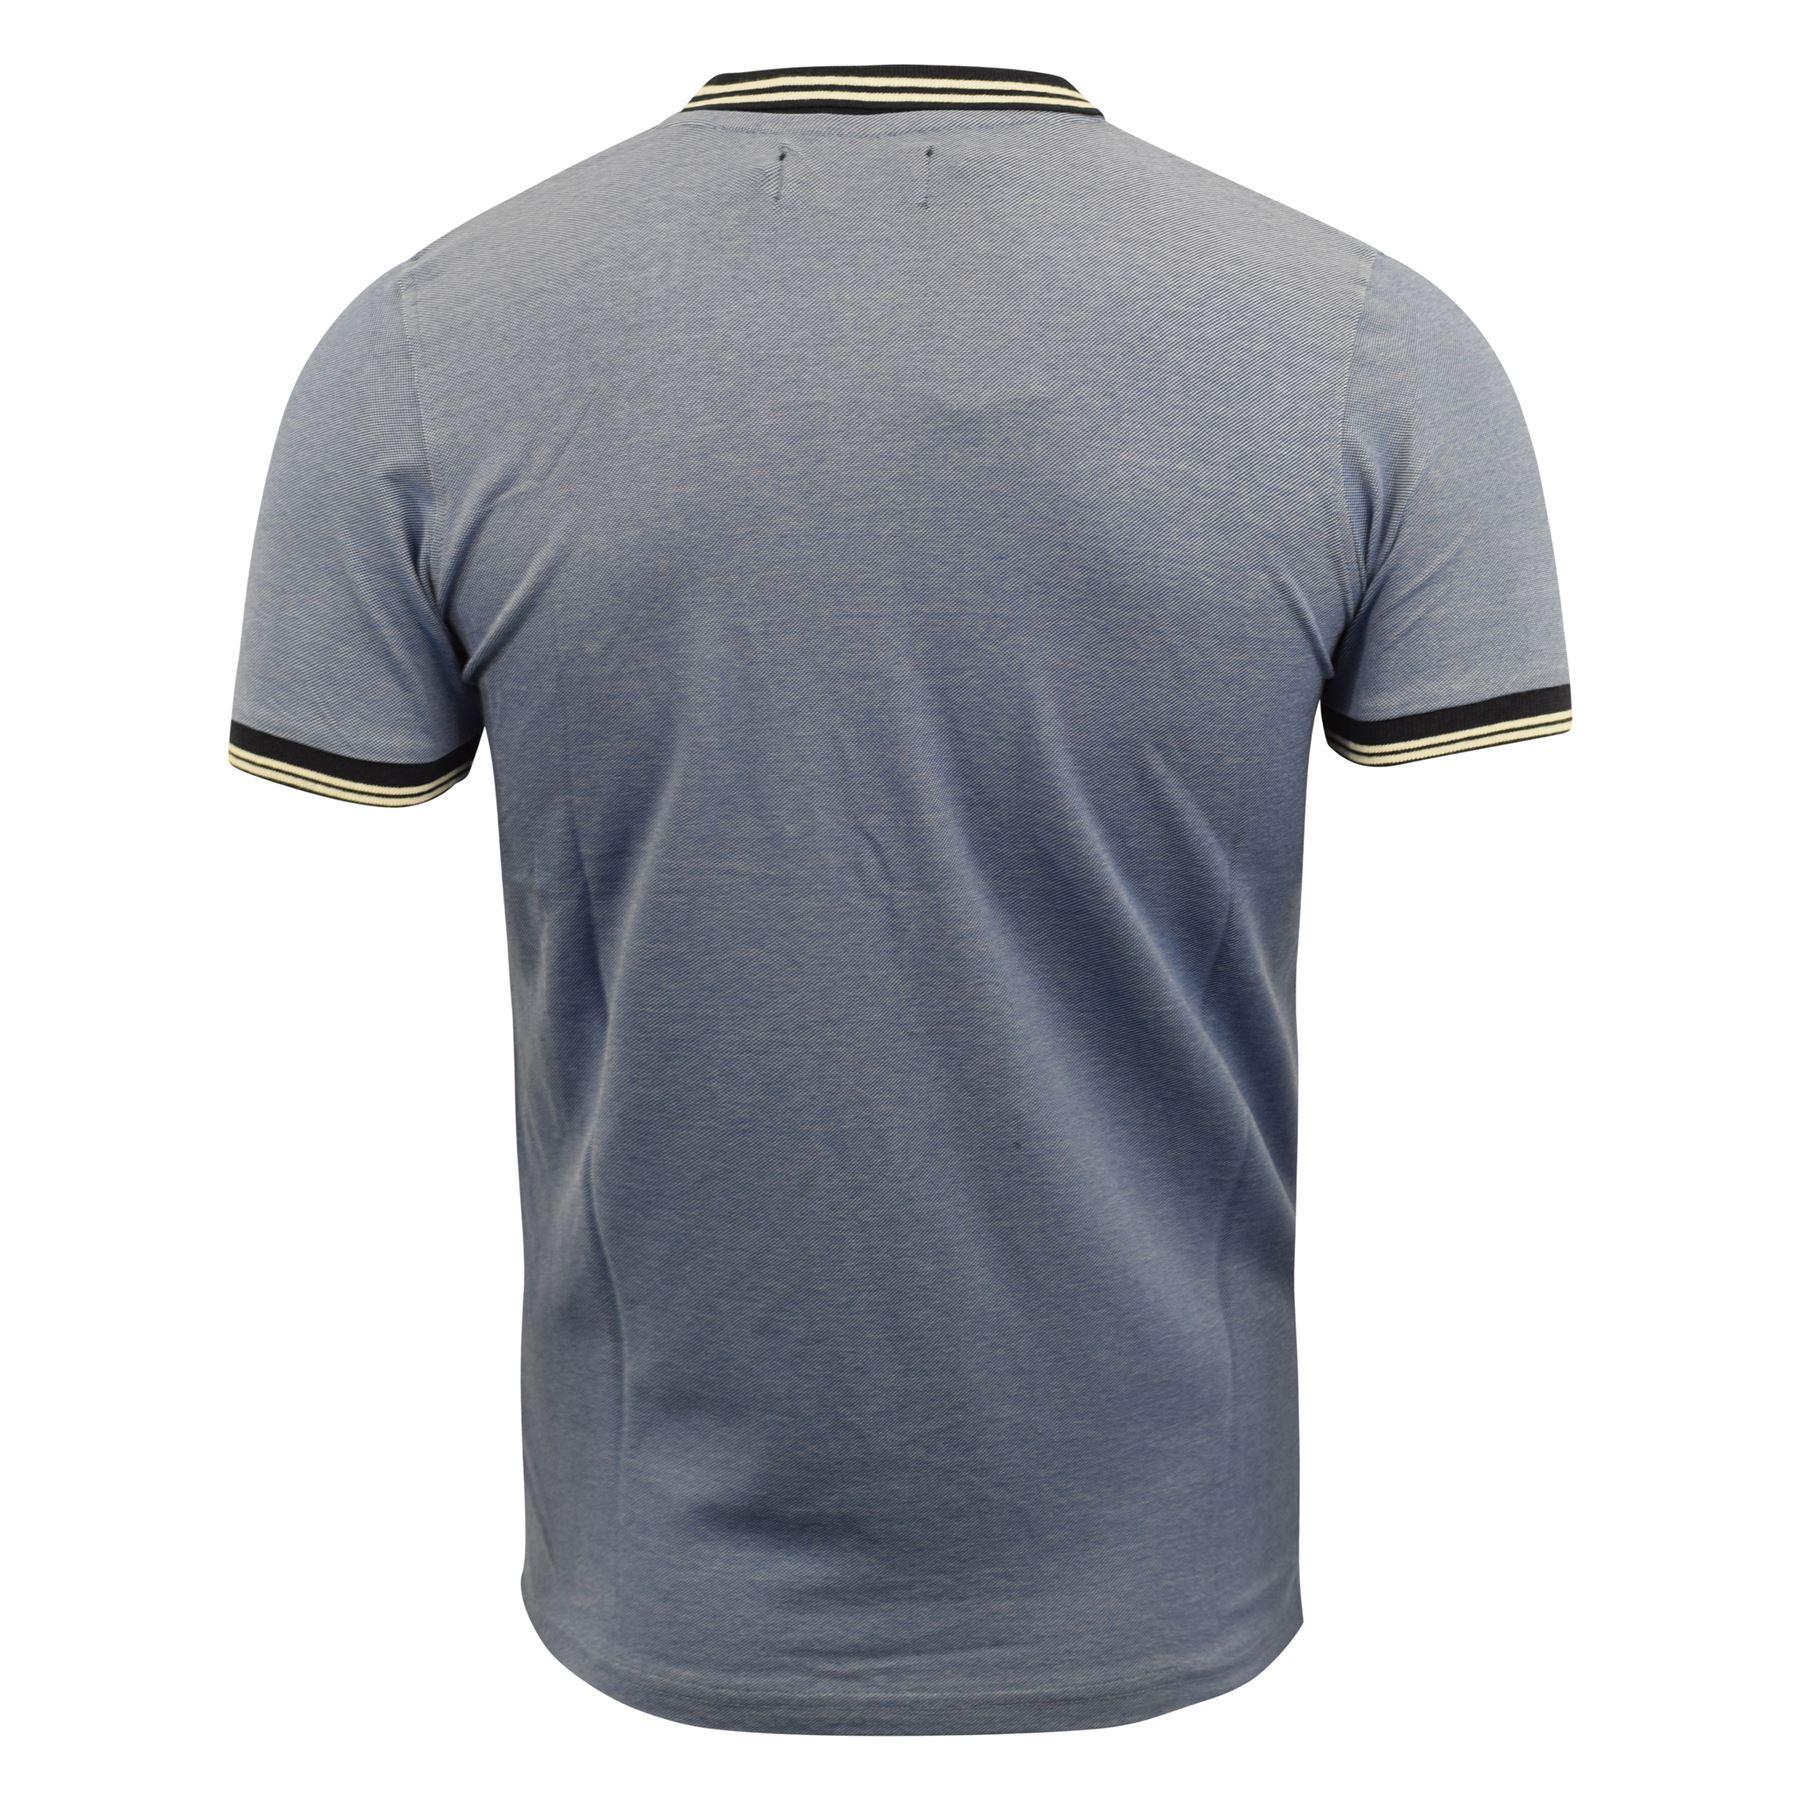 Mens-Polo-Shirt-kangol-Short-Sleeve-T-Shirt-Top-Rumi thumbnail 5